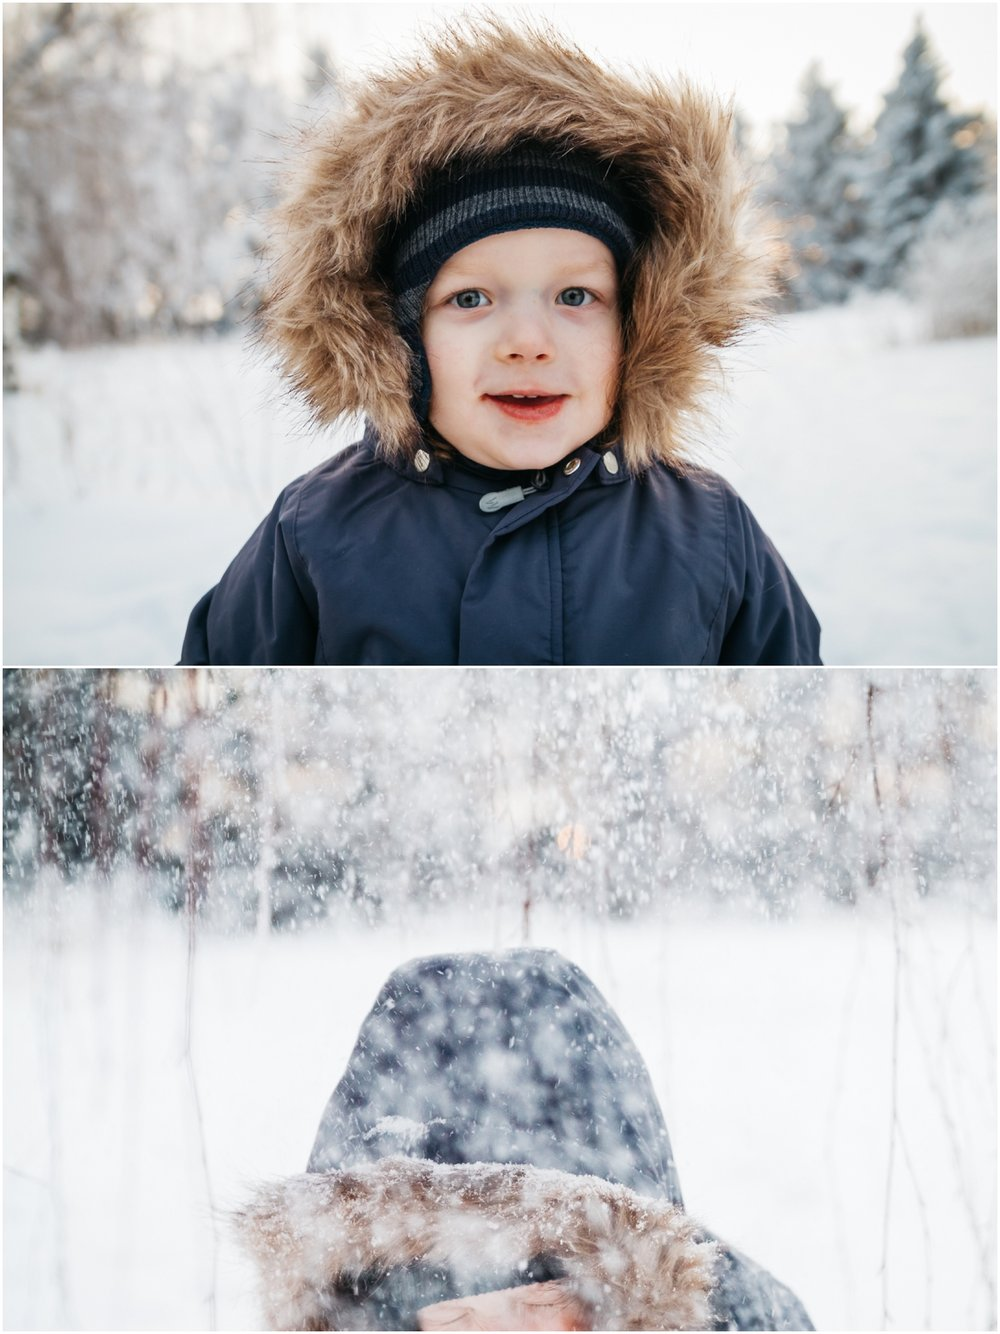 Edmonton Child Photographer - Best of 2016 January